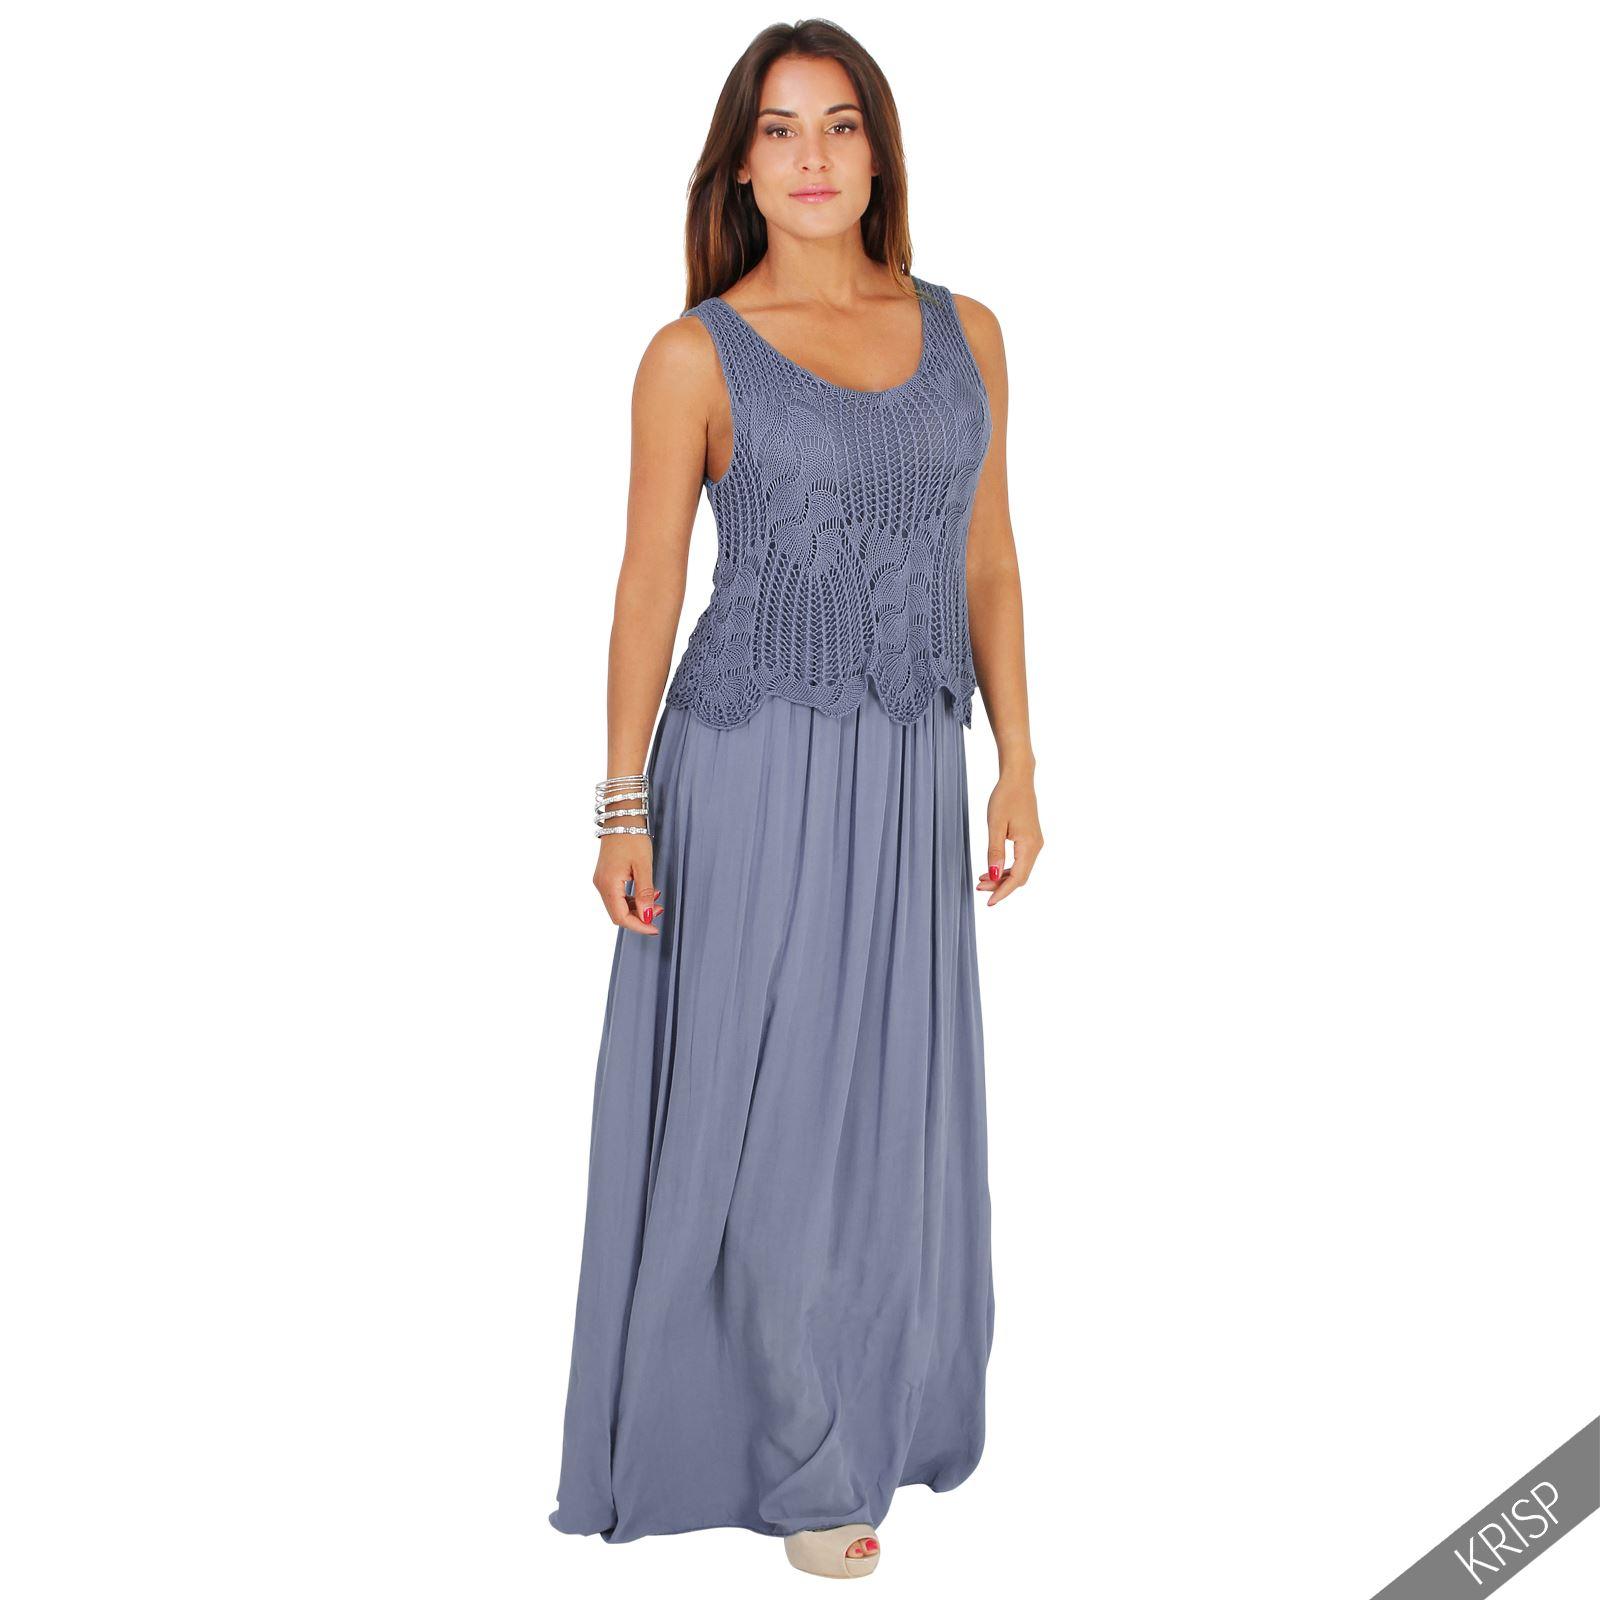 Womens Boho Crochet Top Sleeveless Maxi Dress Long Loose ...